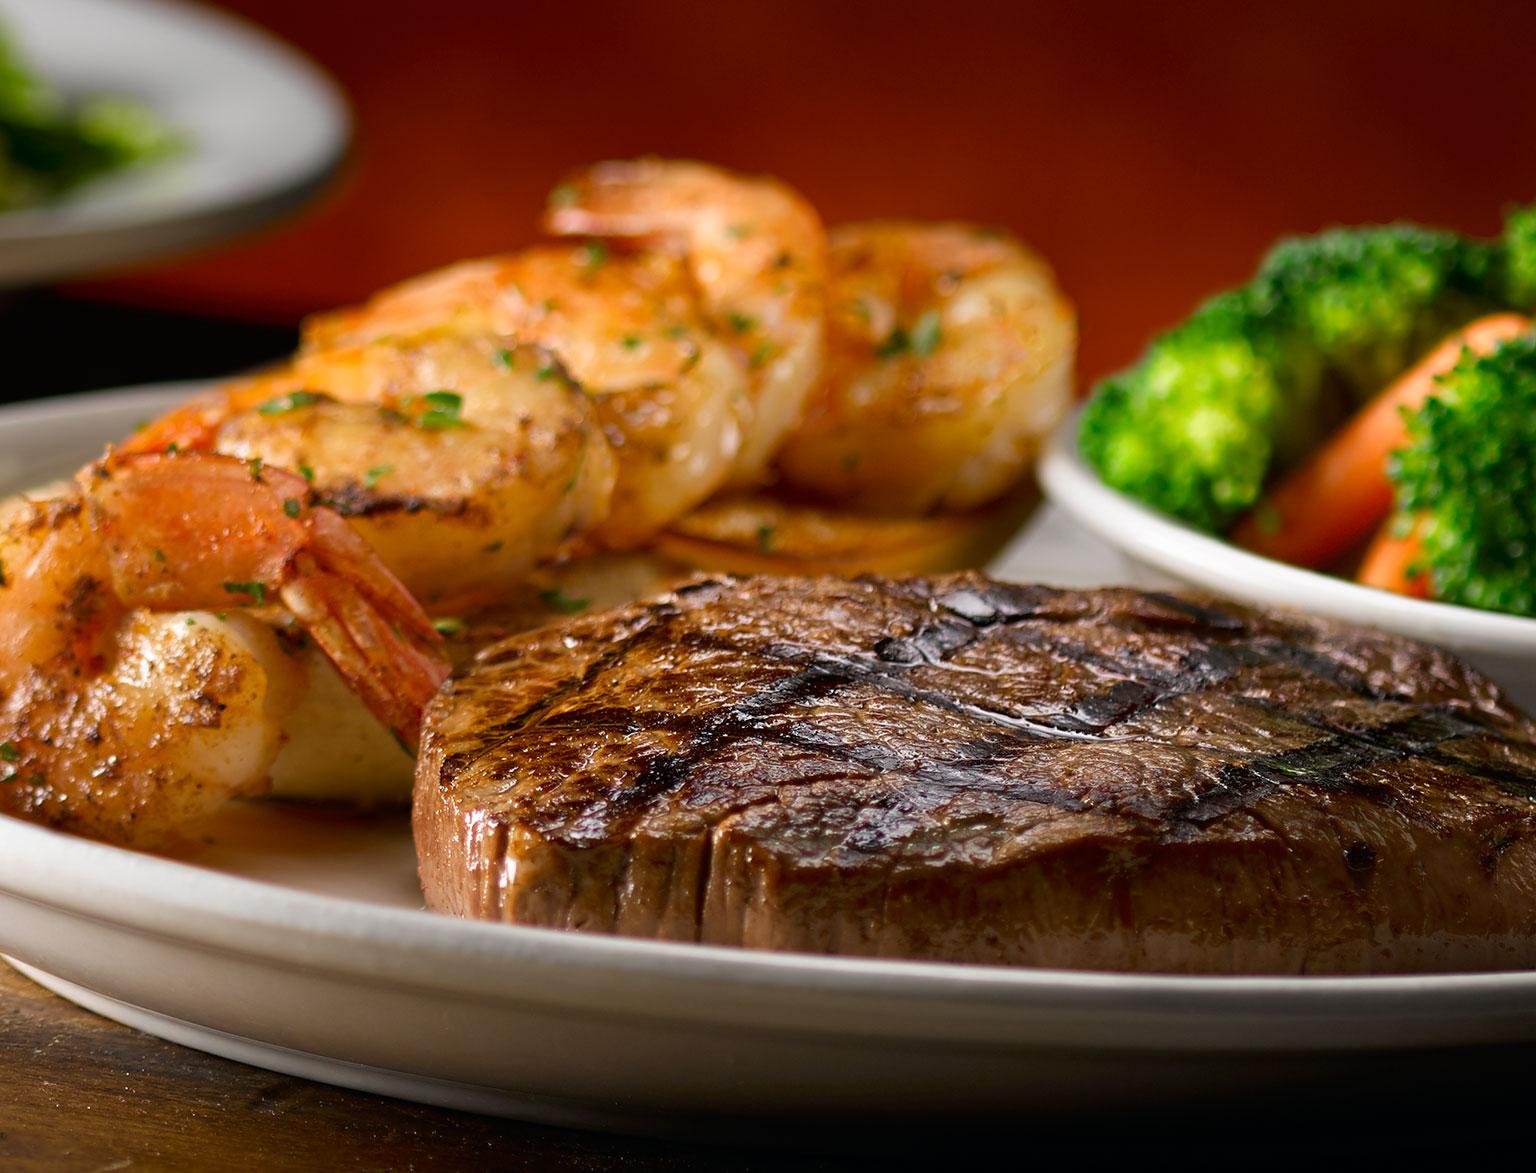 A closeup of a steak, shrimp, and vegetables.